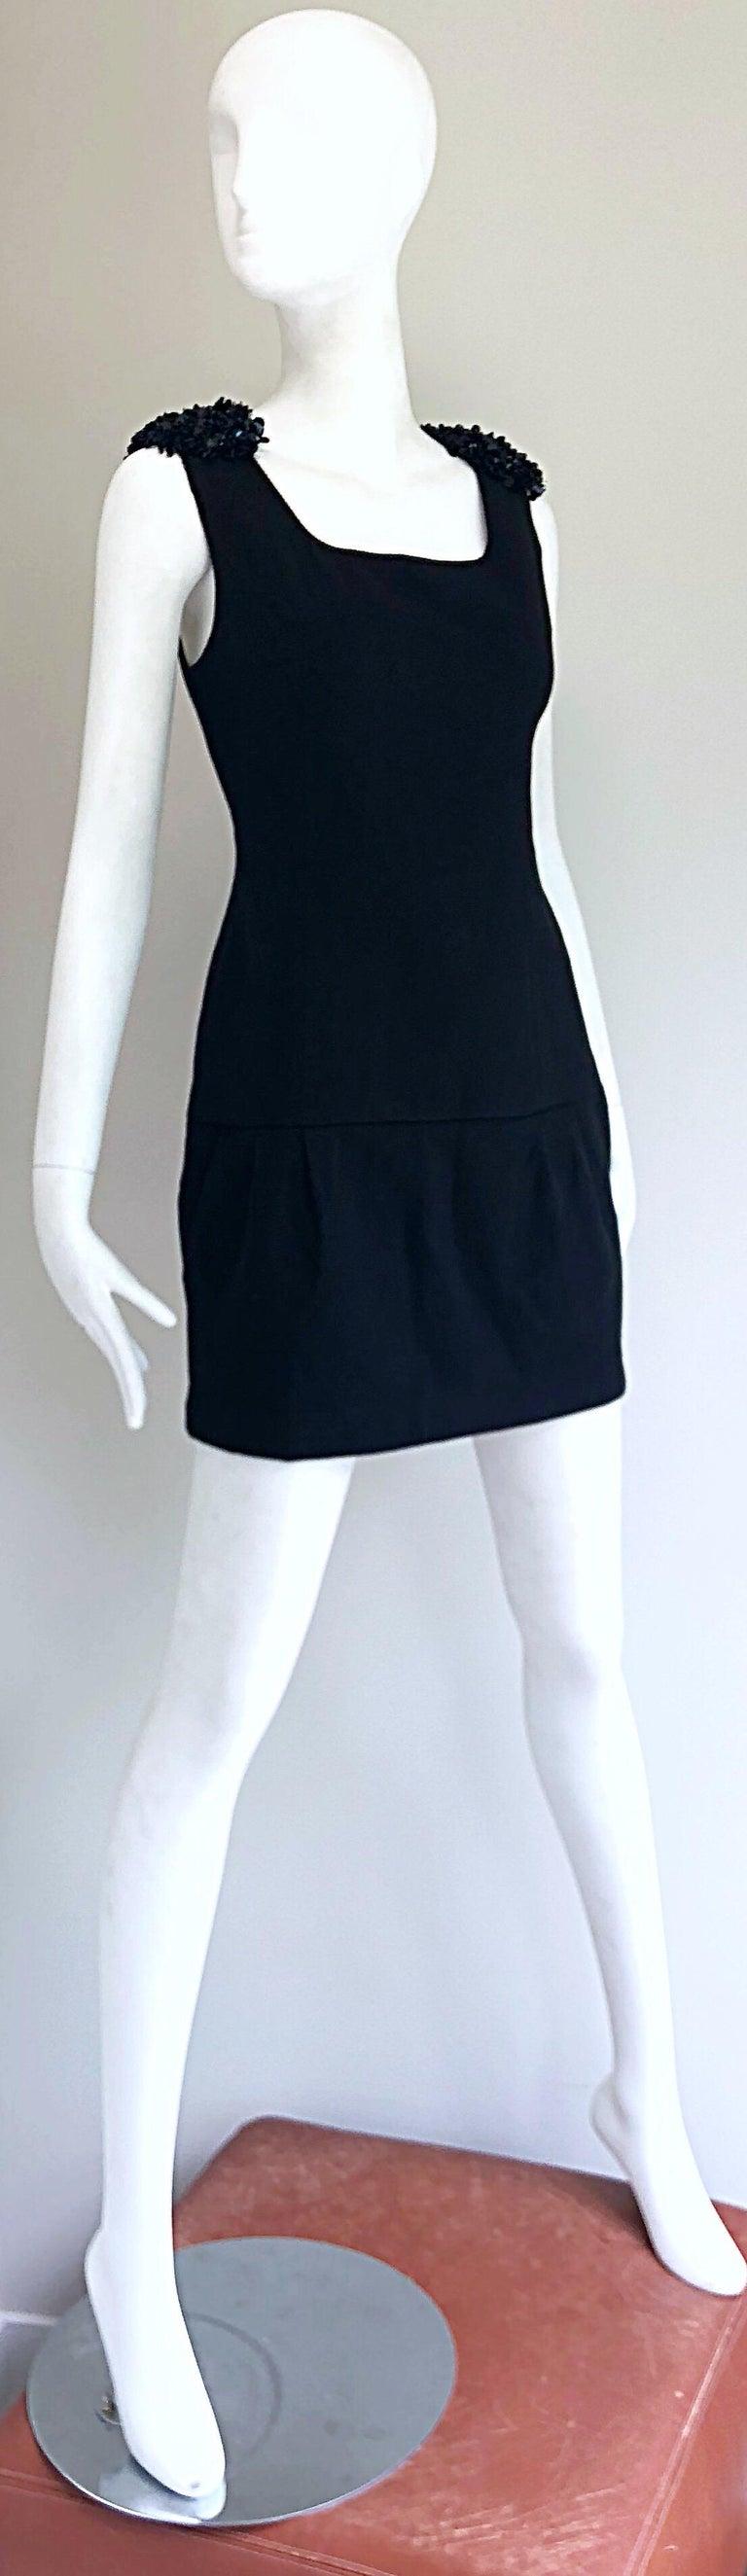 1990s Miu Miu Black Virgin Wool Sequin Beaded Vintage 90s Mini Dress For Sale 6